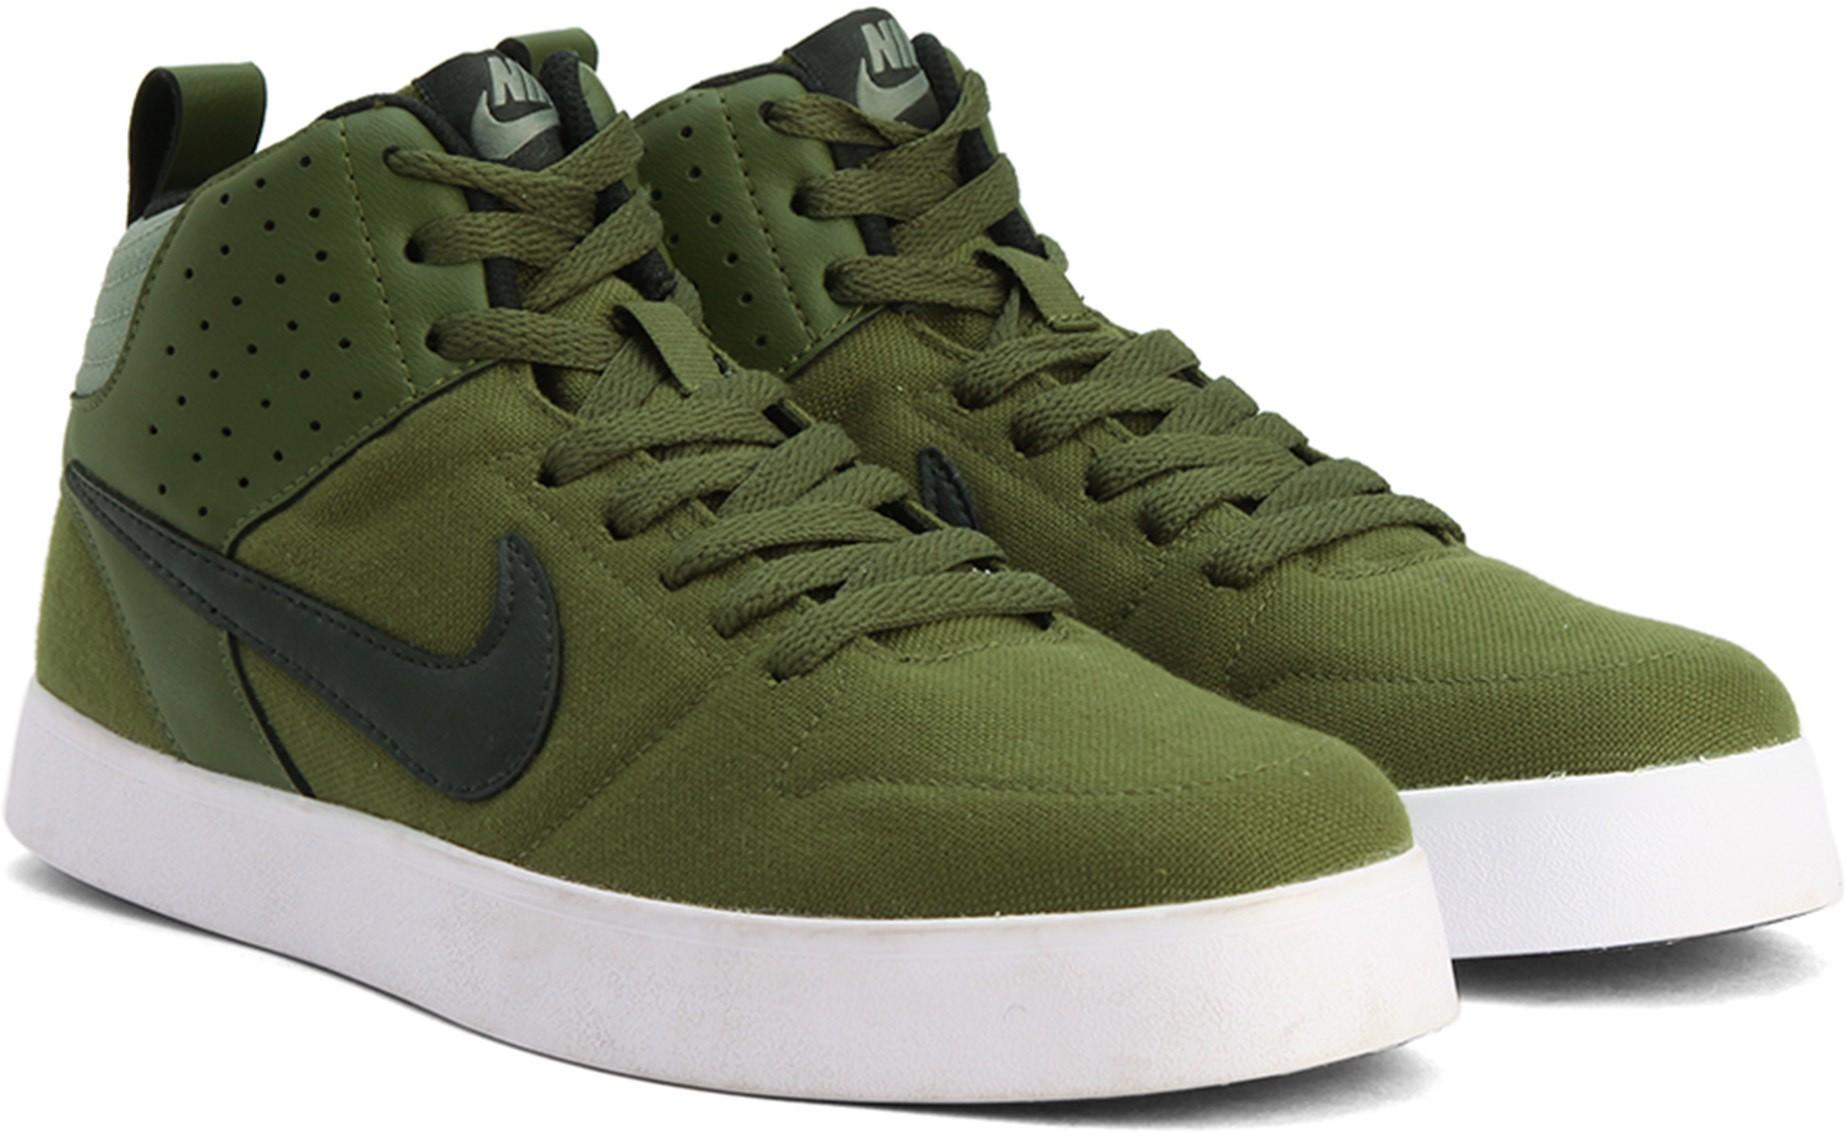 Flipkart - Men's Casual Shoes Nike, Puma & more